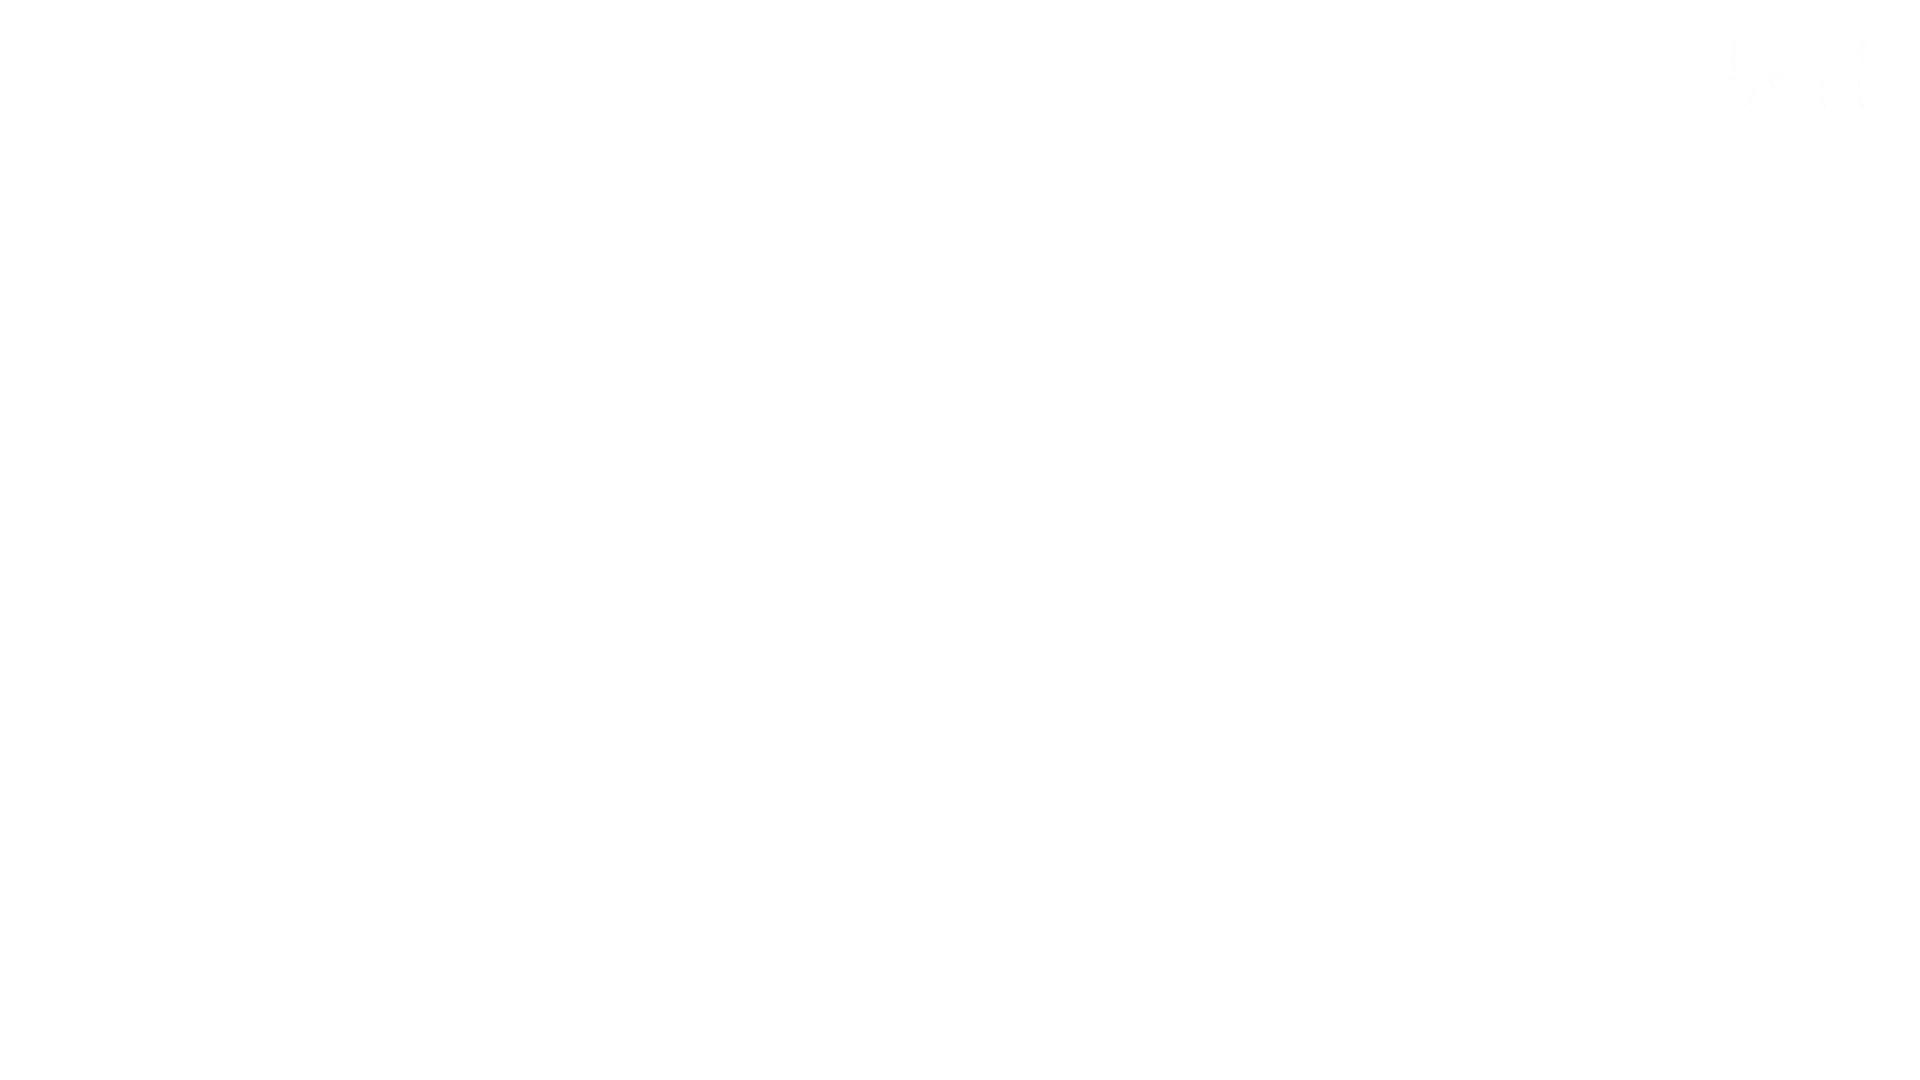 至高下半身盗撮-PREMIUM-【院内病棟編 】VOL1 アラ30  81画像 72